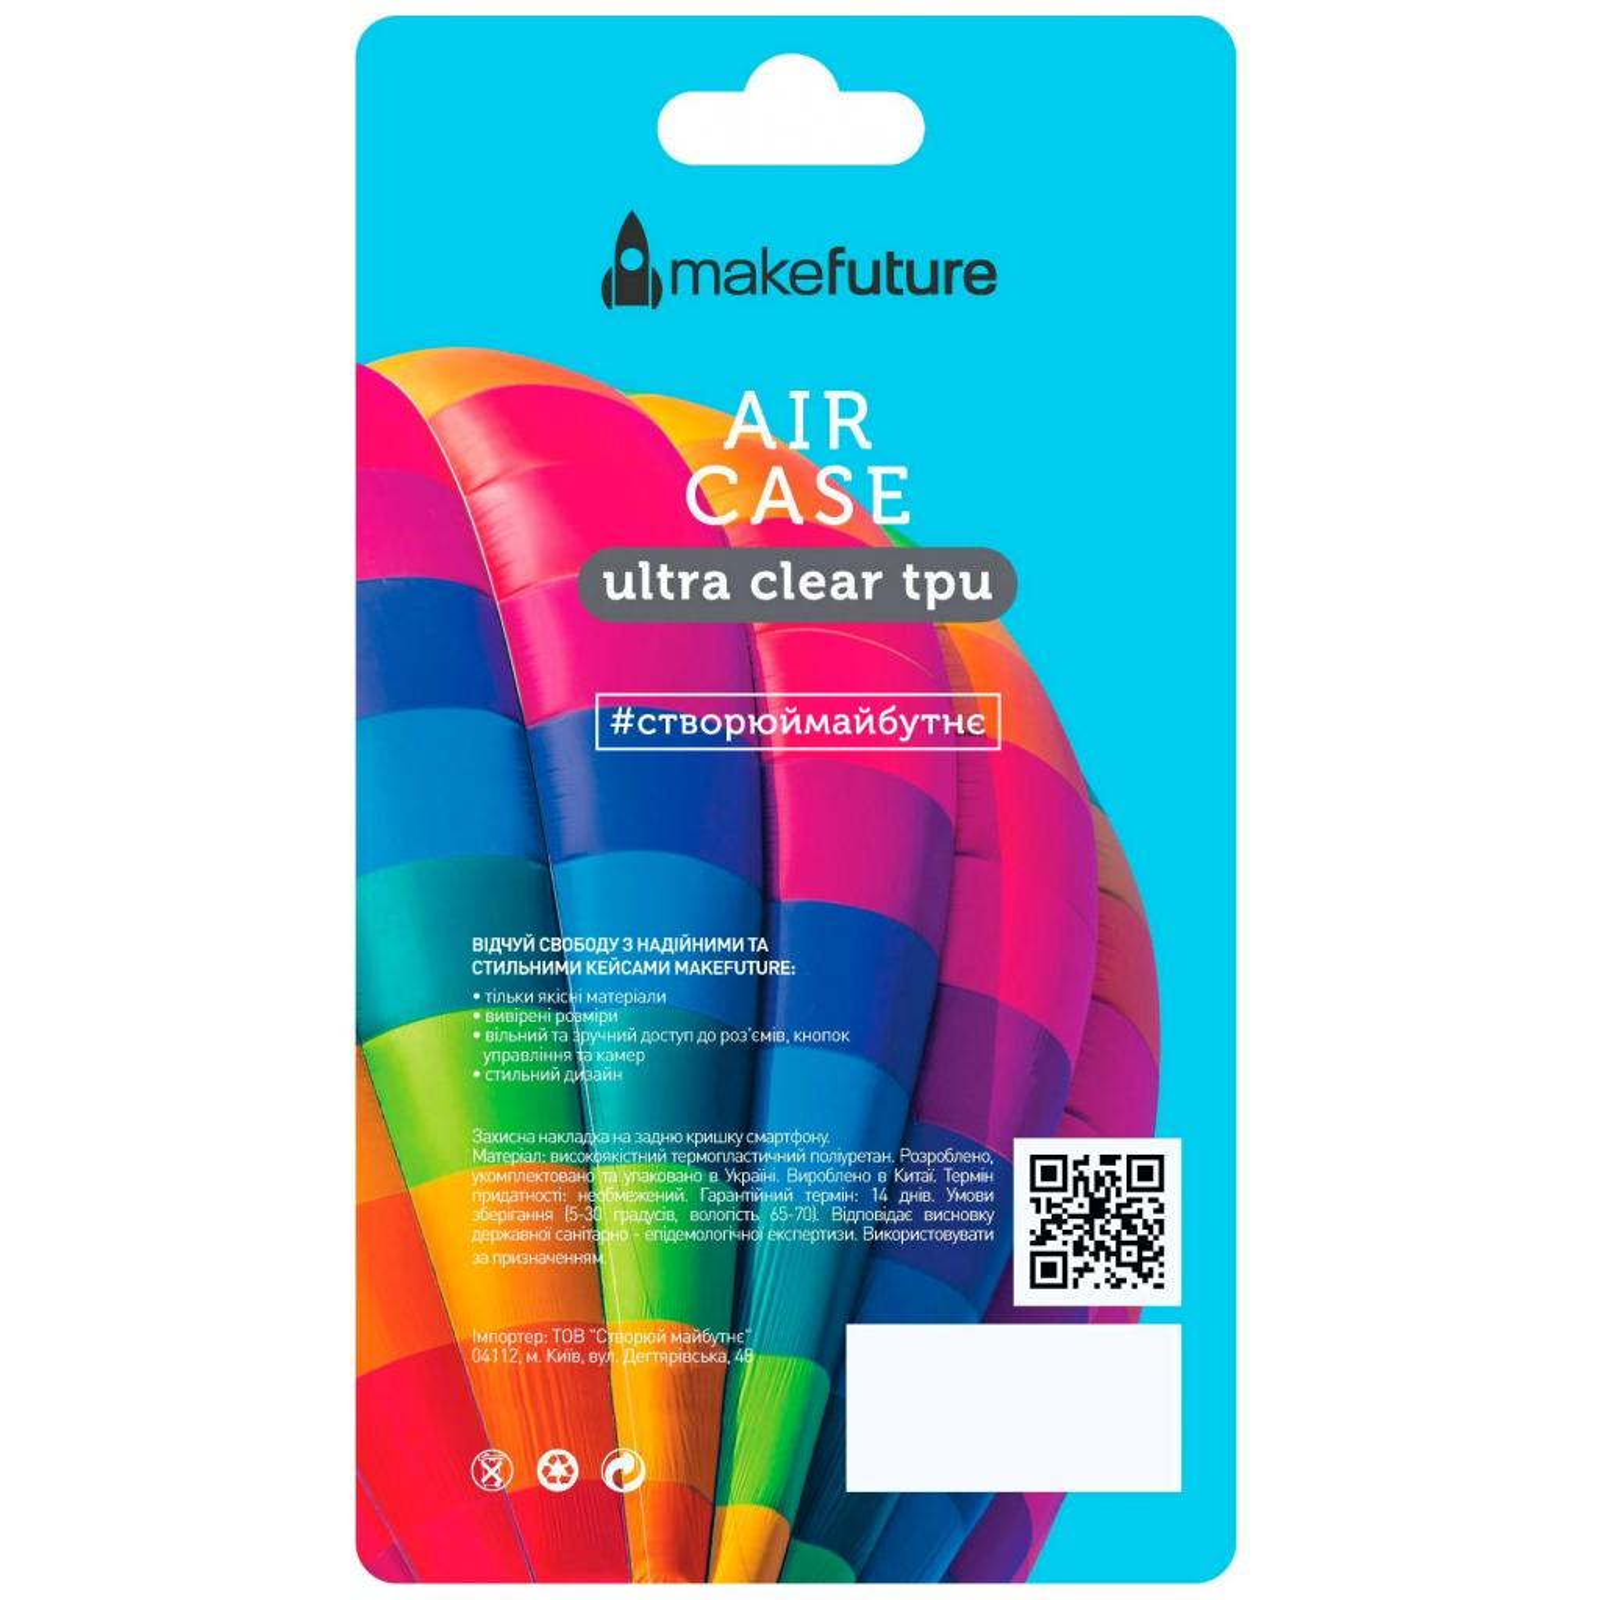 Чехол для моб. телефона MakeFuture Air Case (TPU) Samsung J8 2018 Clear (MCA-SJ818CL) изображение 4